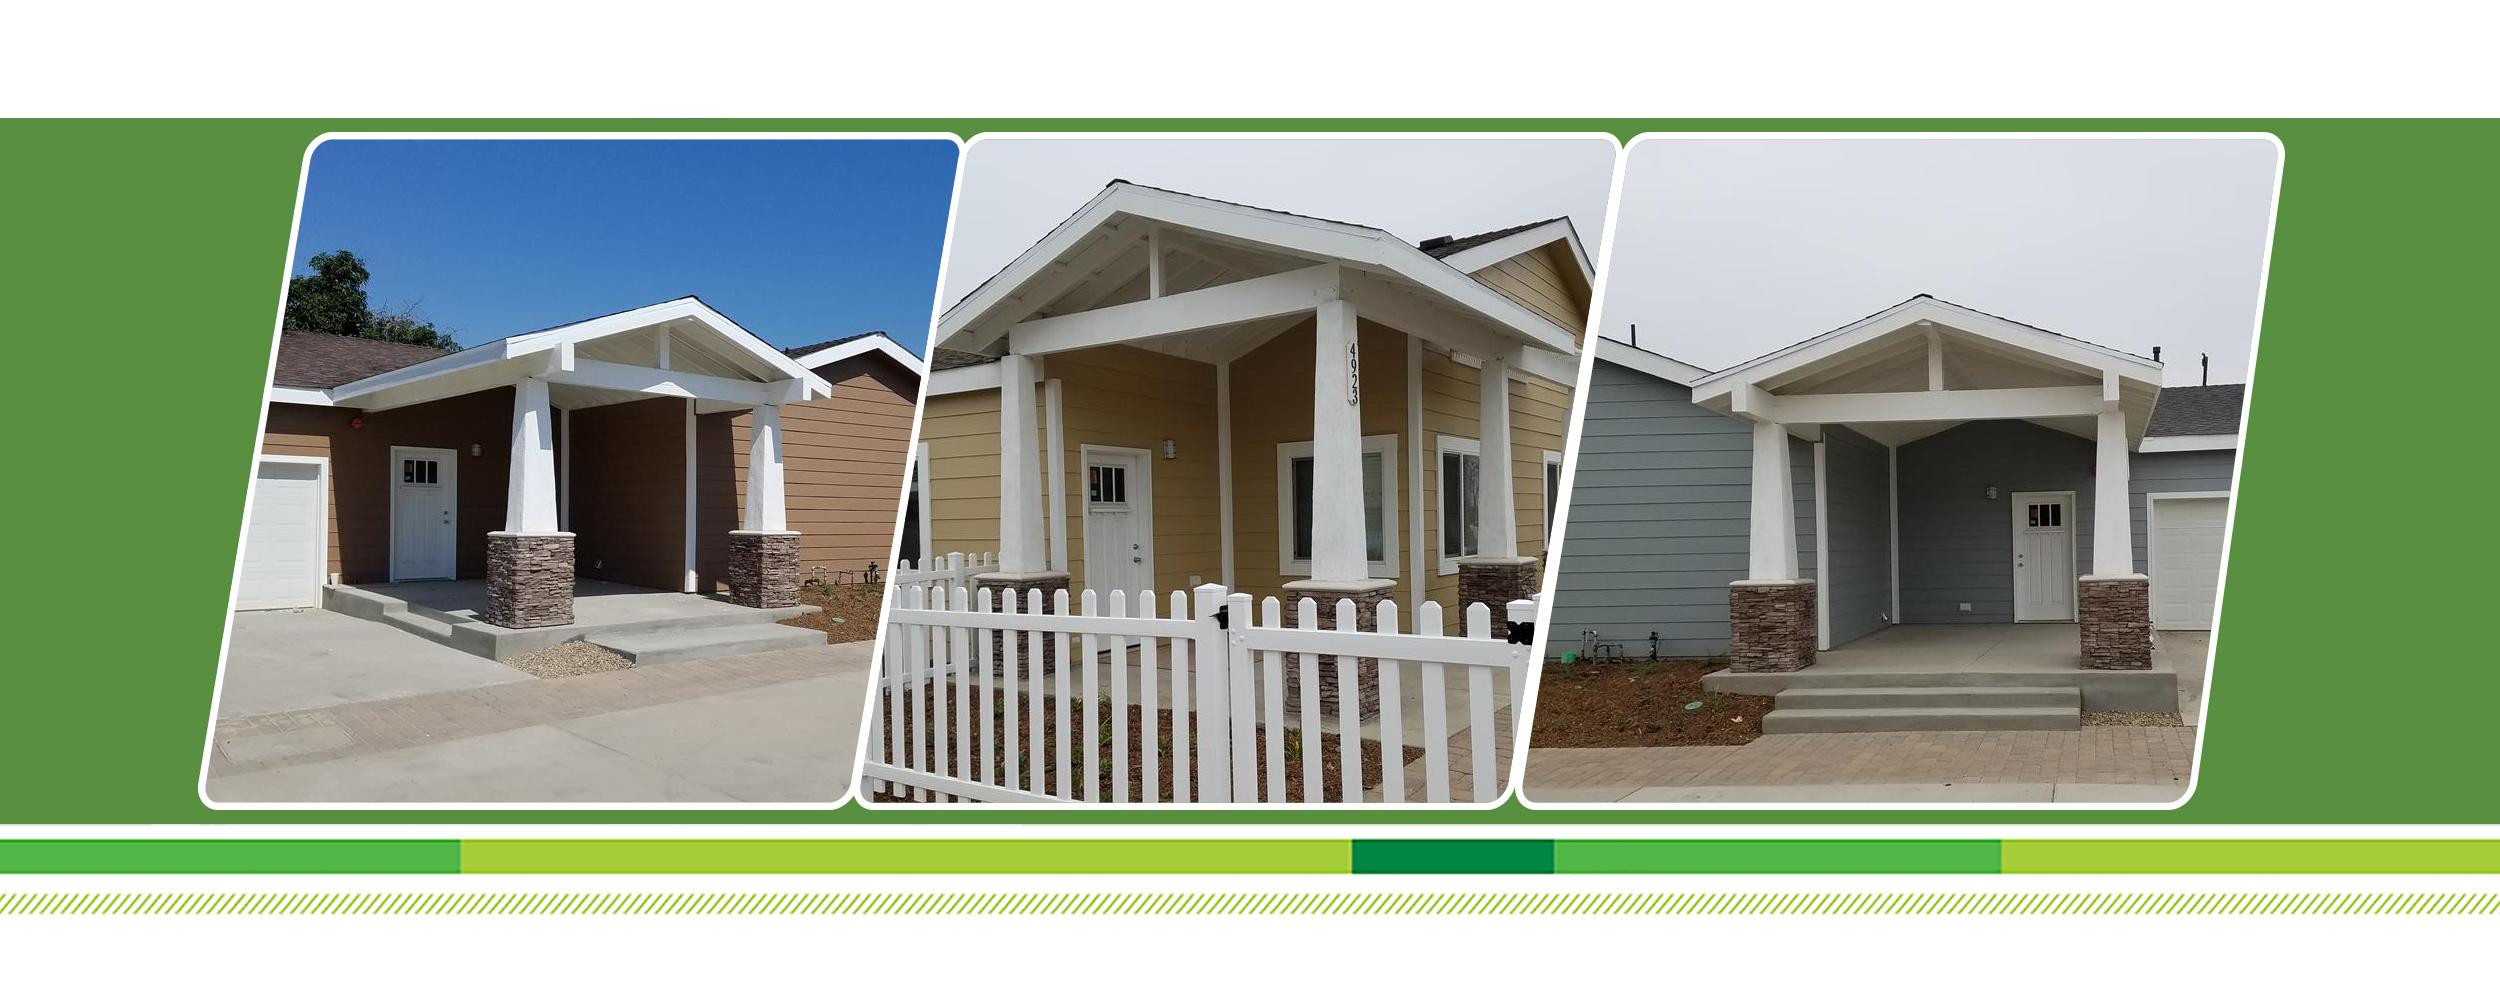 Villa del sol ribbon cutting new homes in Chino